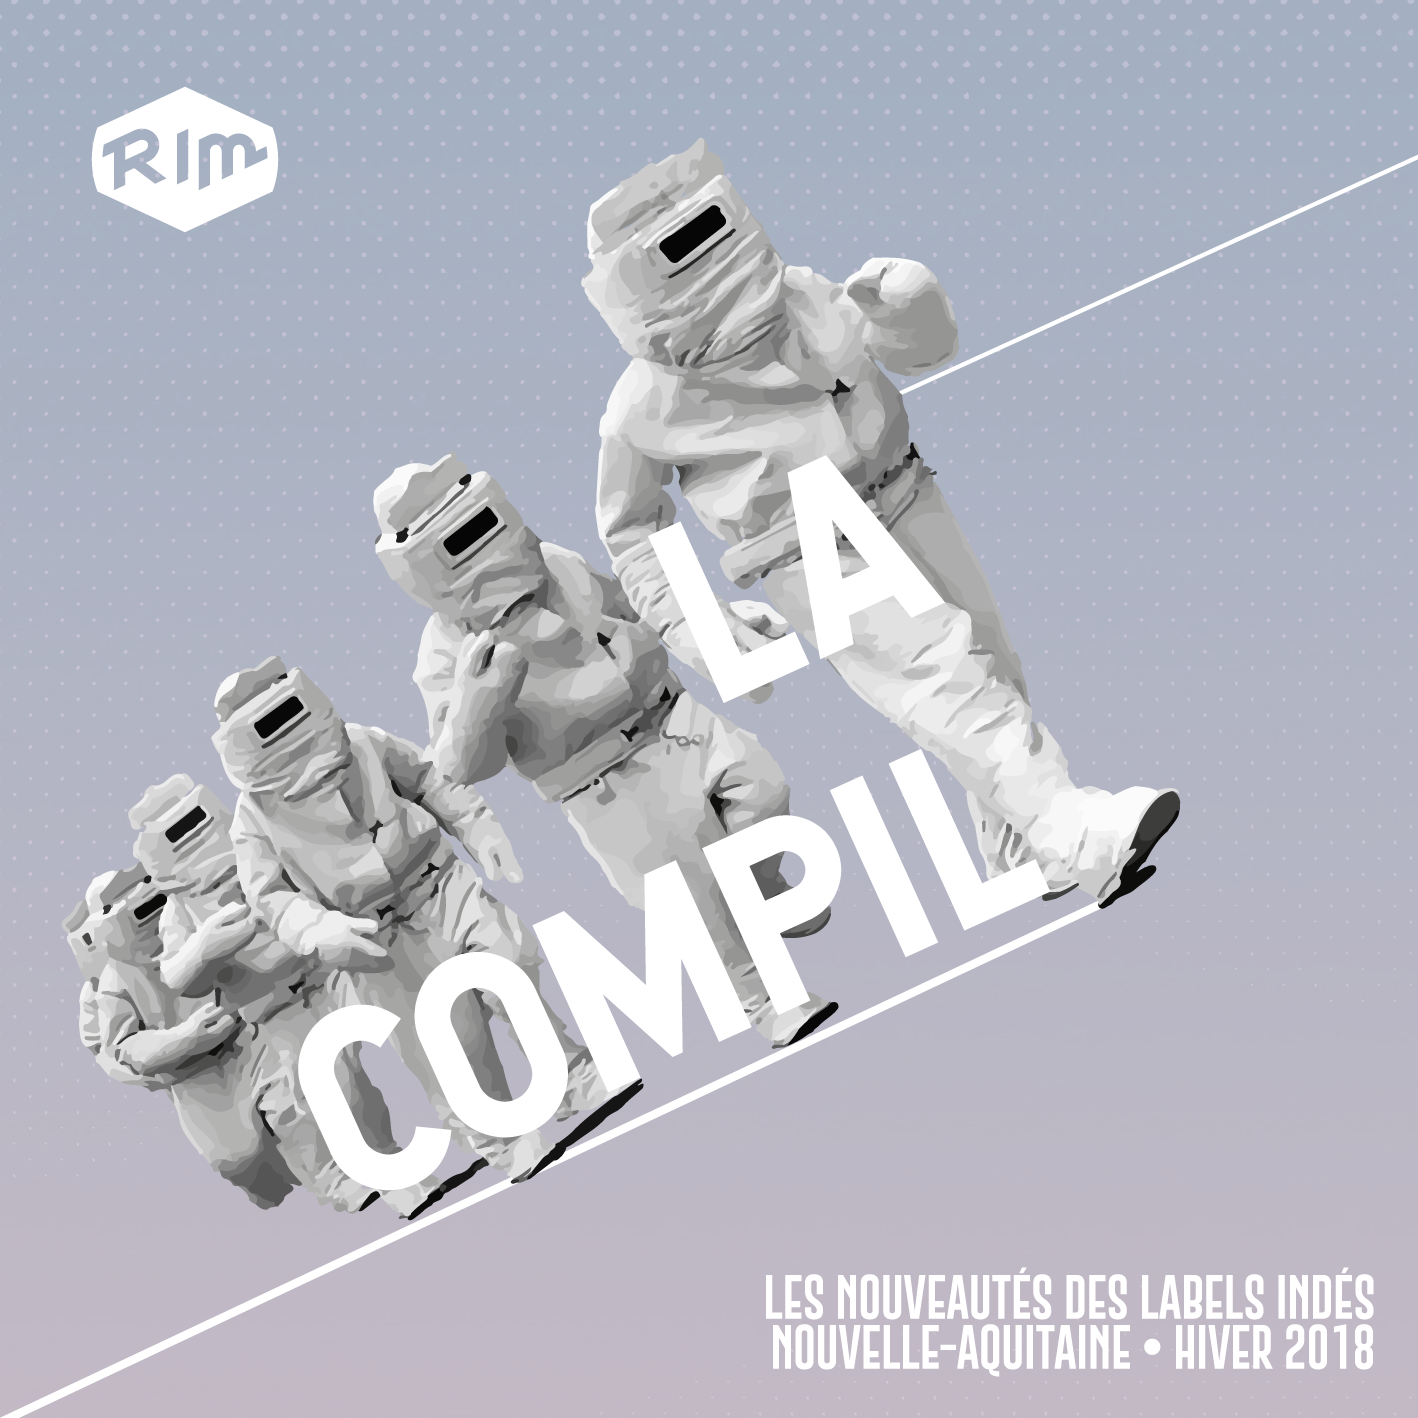 http://compilation.le-rim.org/uploads/compilations/compilation_11/pochette_Cover%20compil%20hiver.png